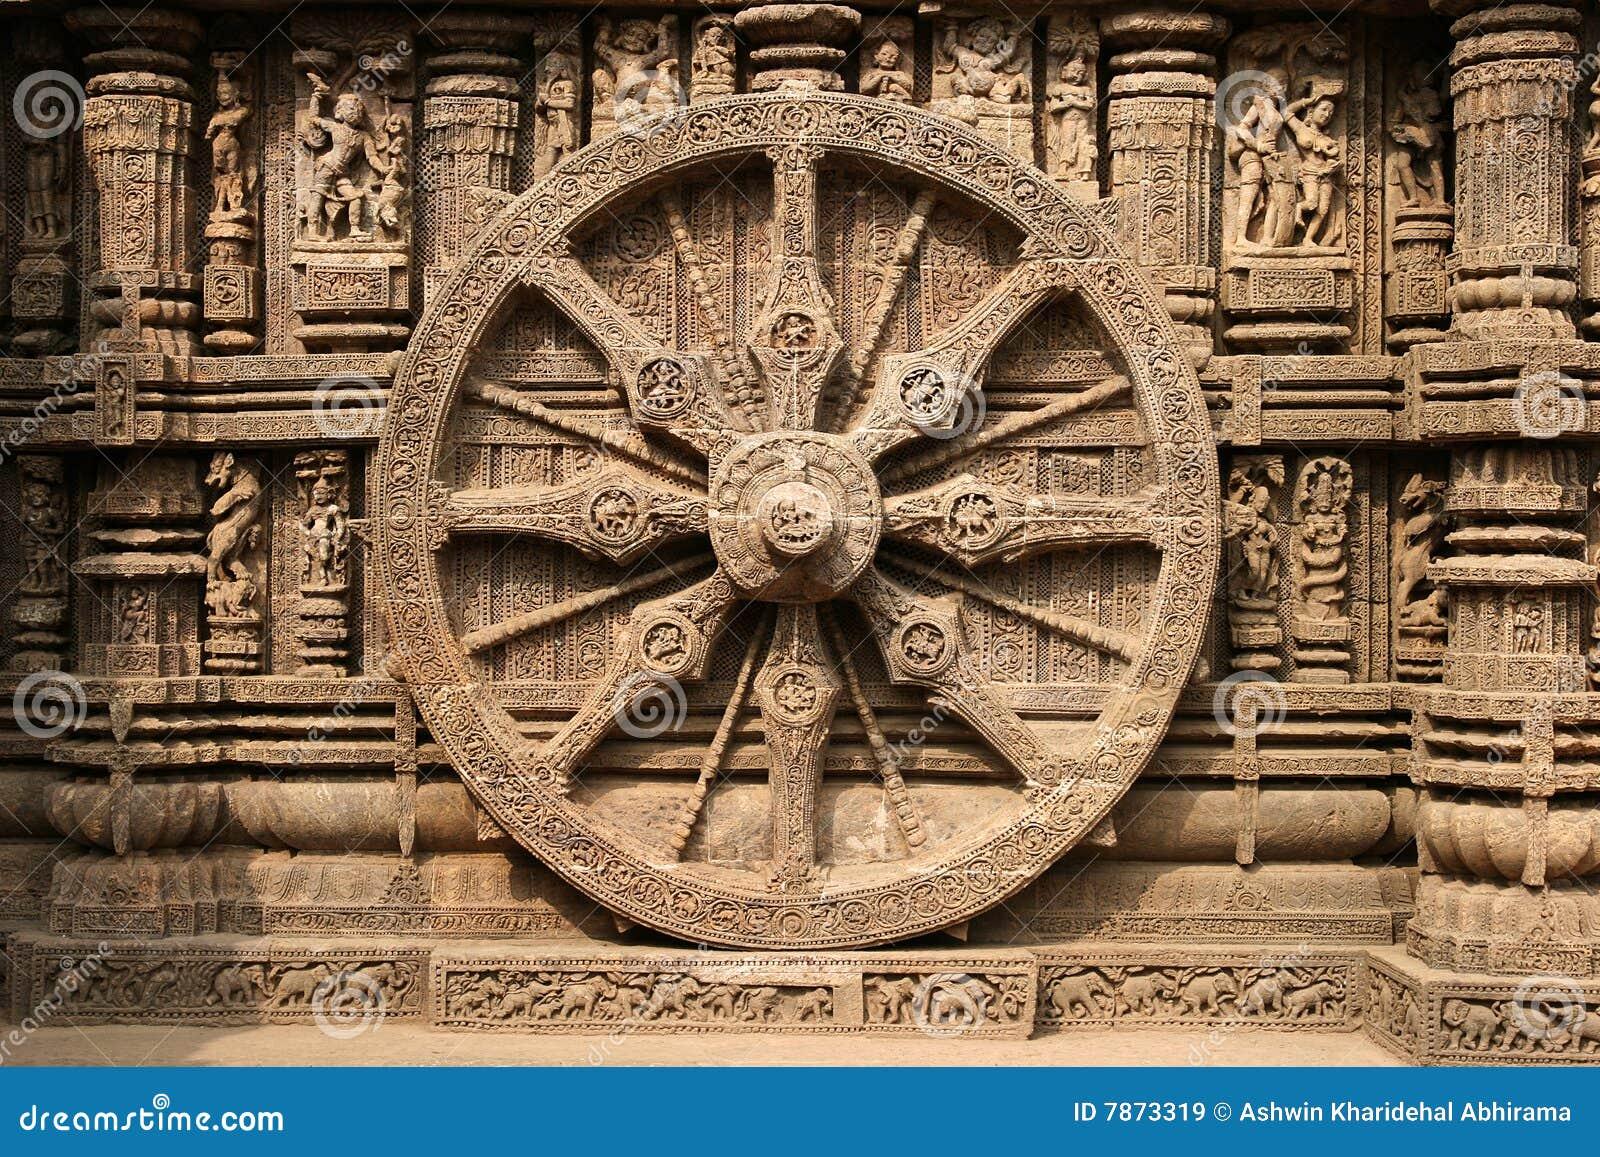 Ancient Hindu Temple at Konark (India)